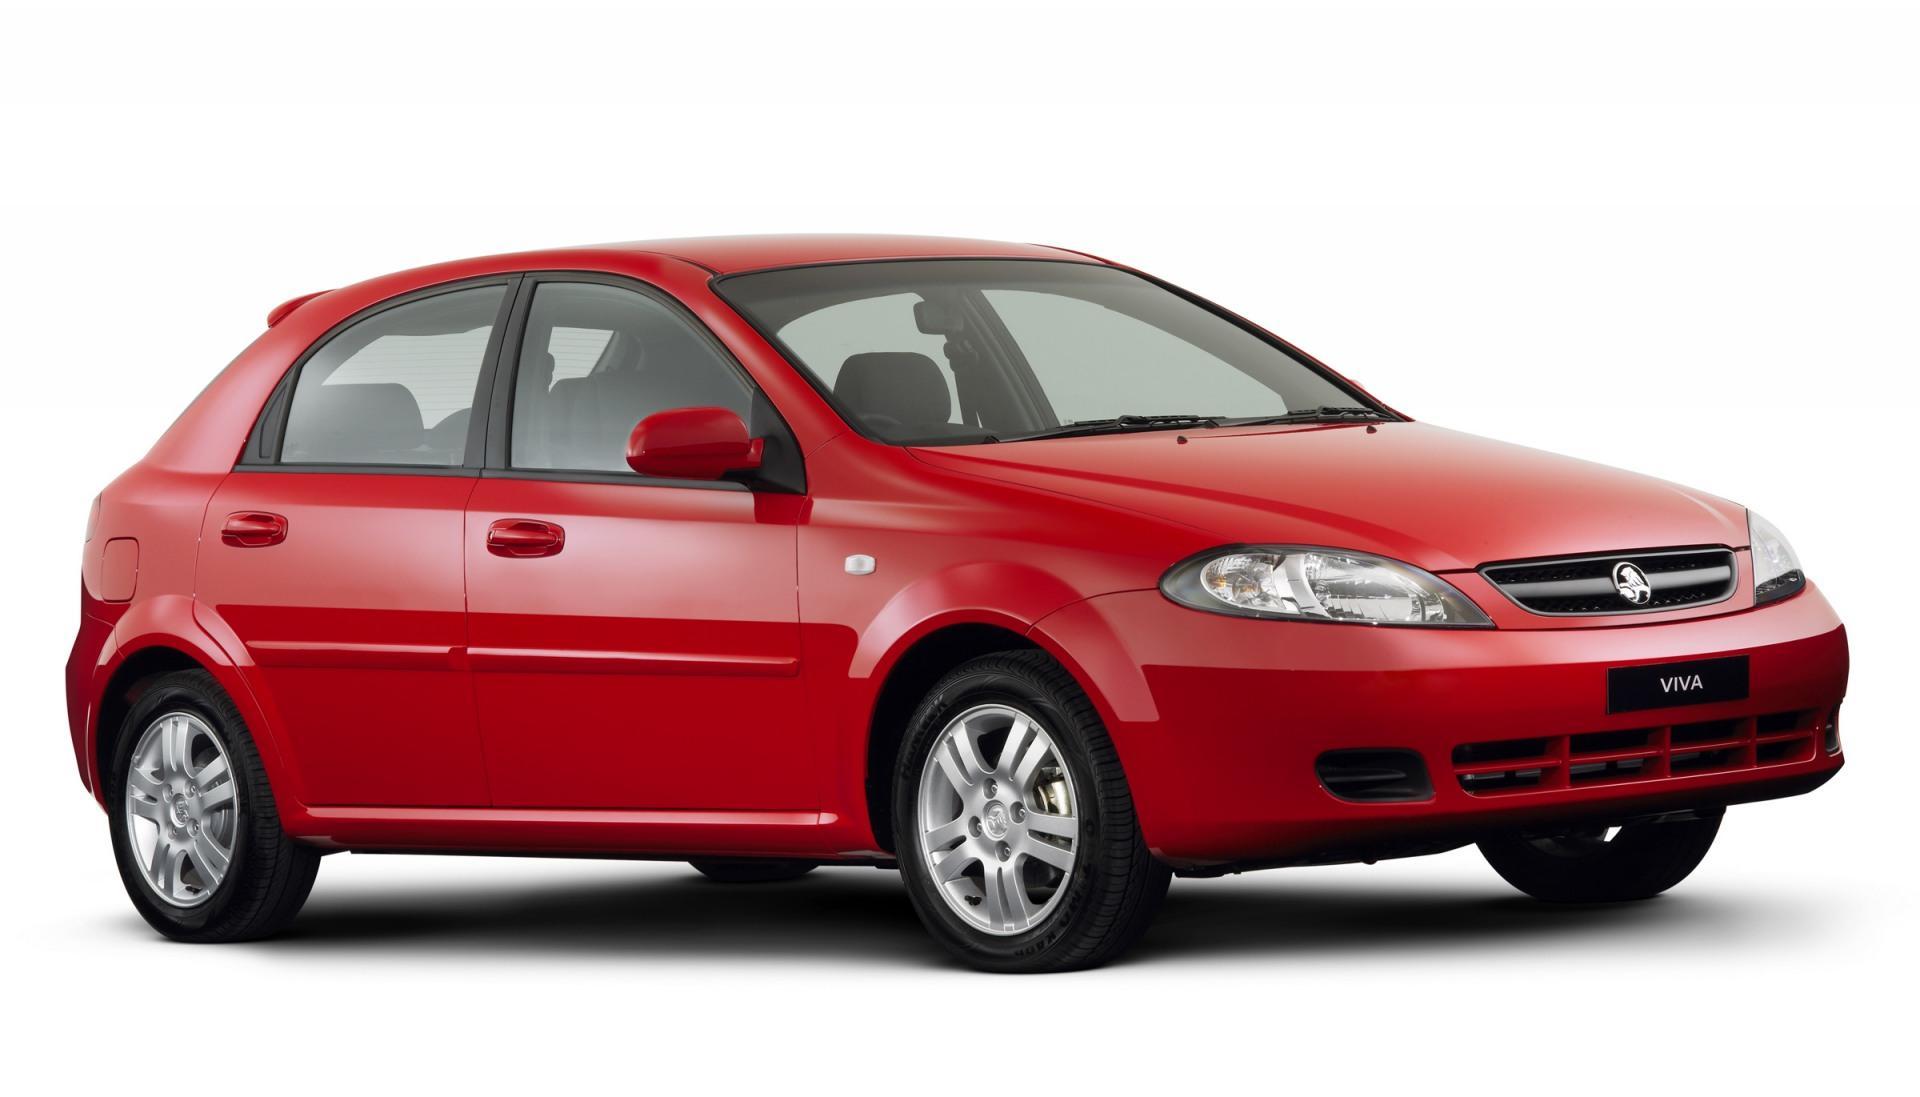 2009 Holden Viva - conceptcarz.com